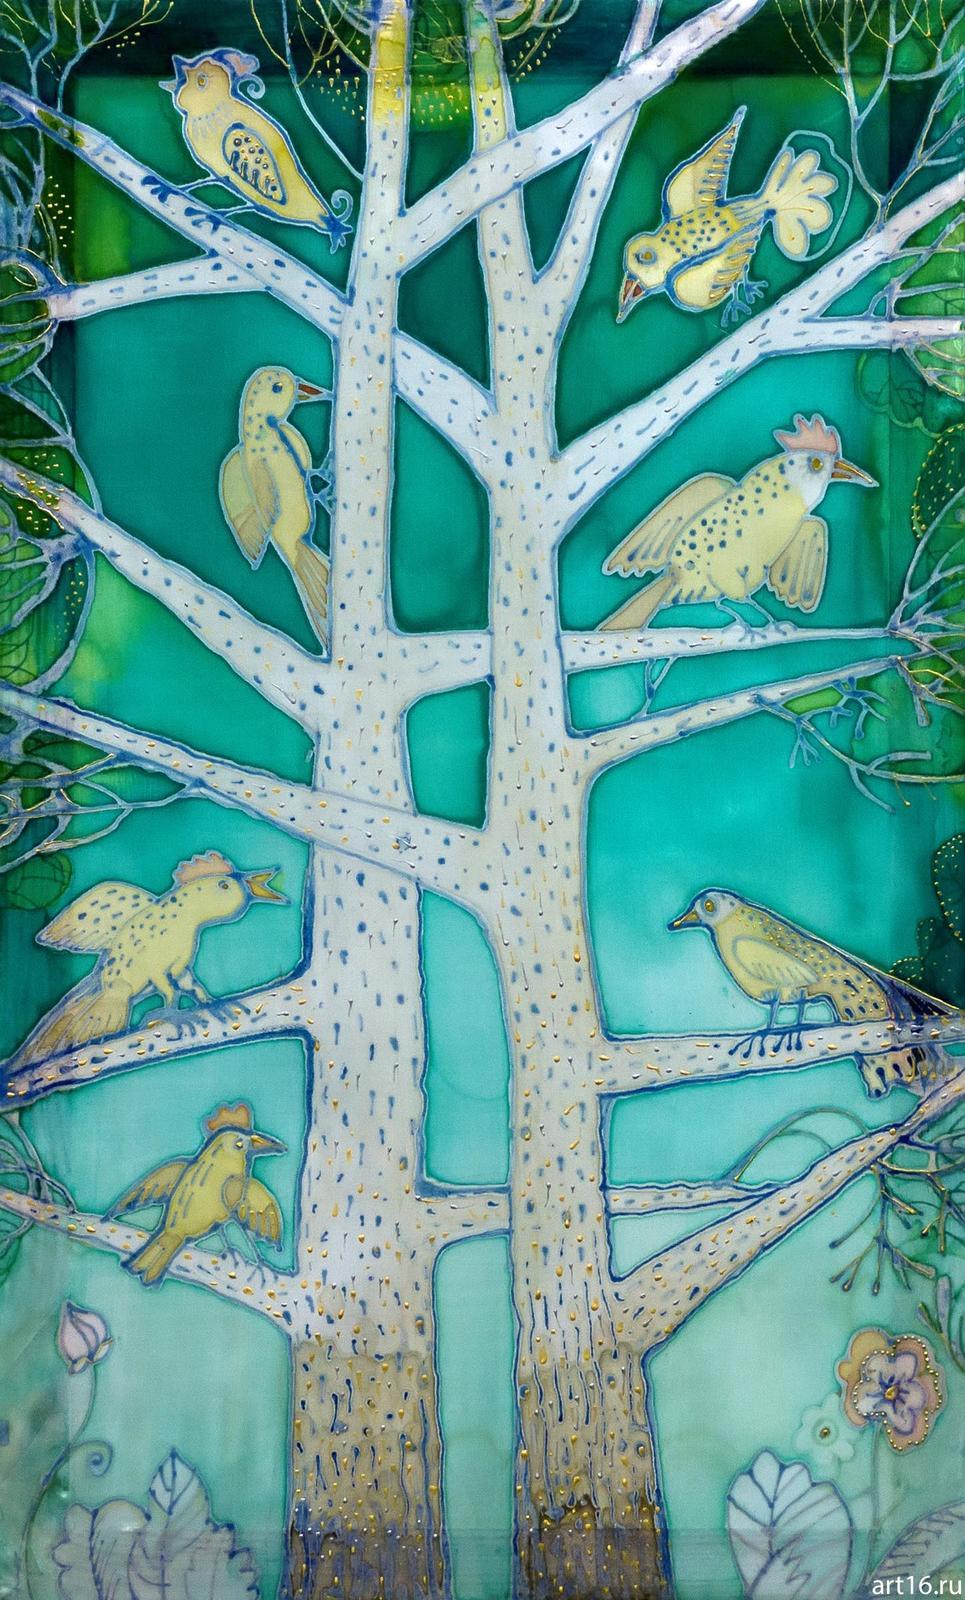 Фото №894862. Батик «Два дерева». Нина Кузьминых, 1956